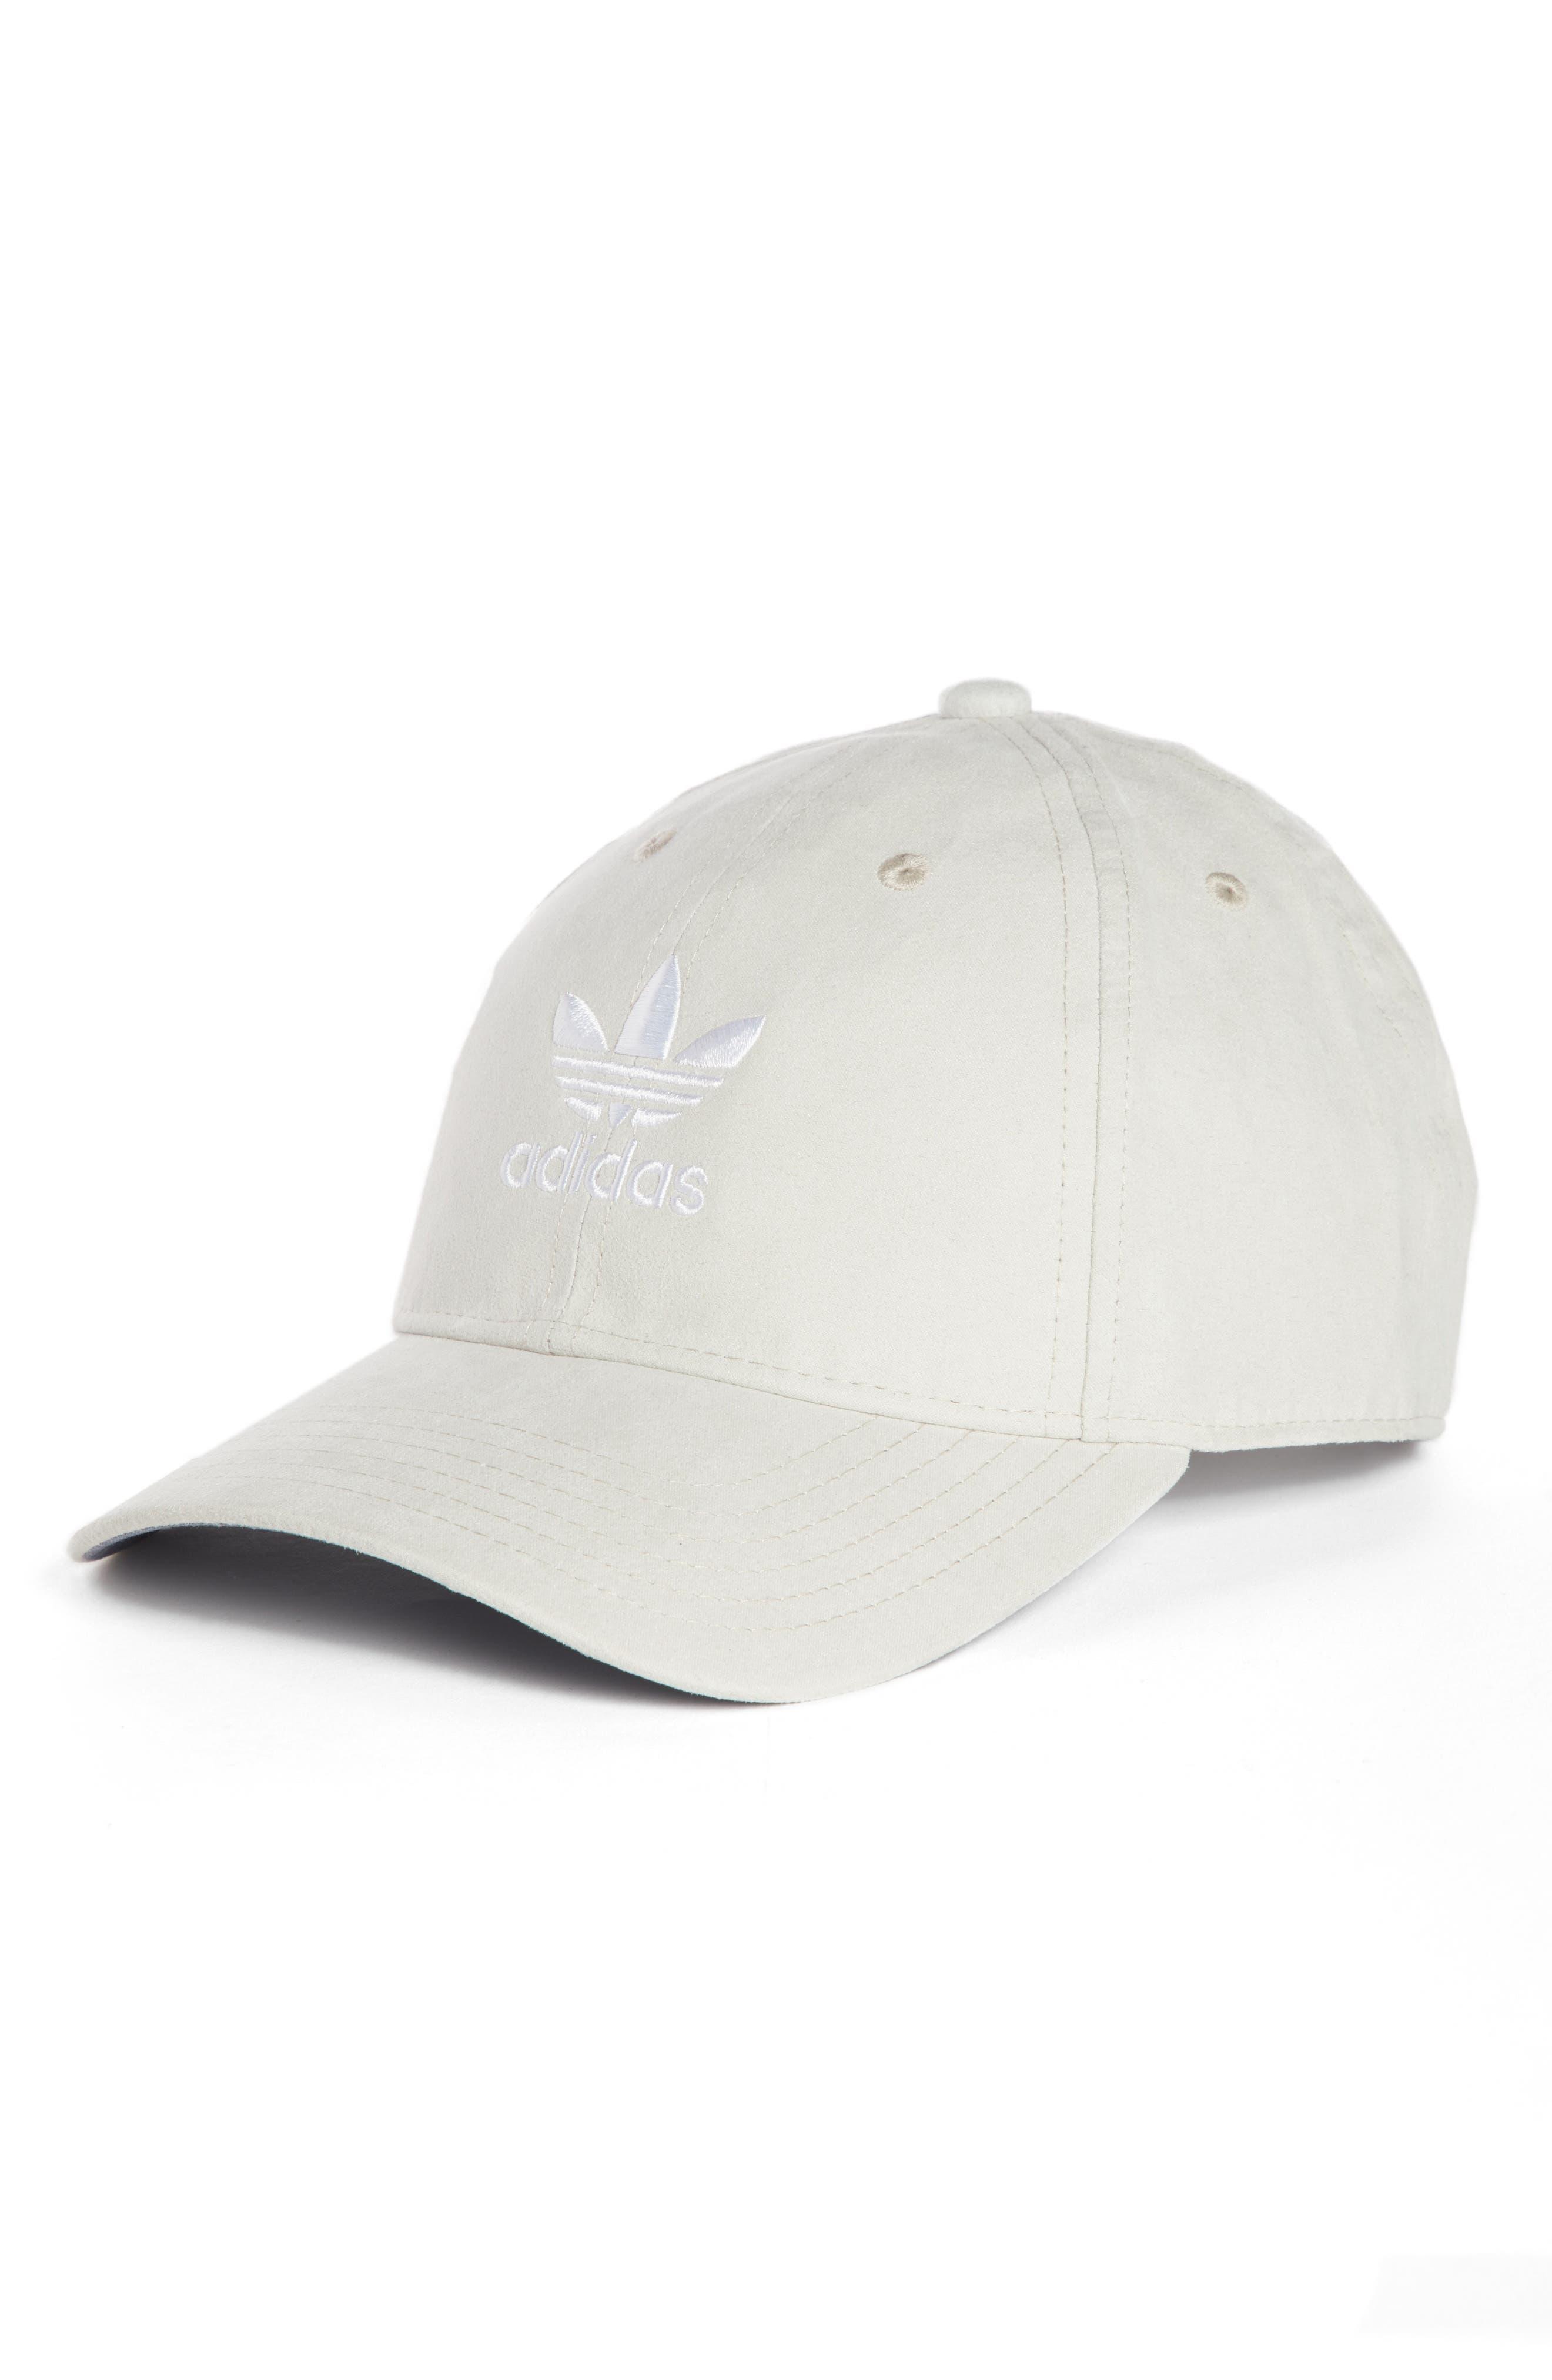 Main Image - adidas Originals Relaxed Strap-Back Cap